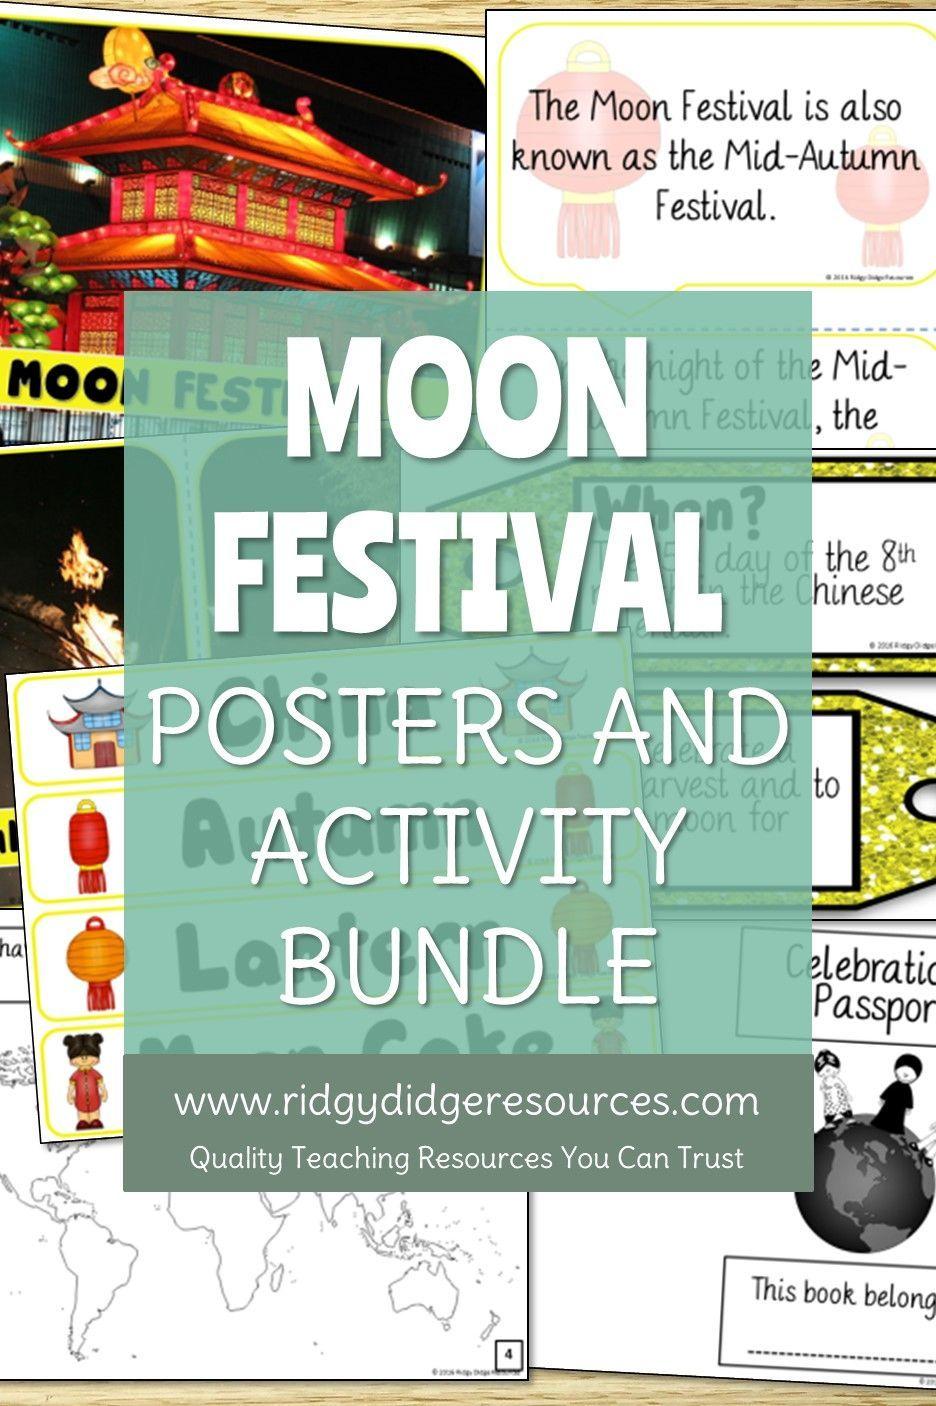 Celebrations around the world moon festival bundle